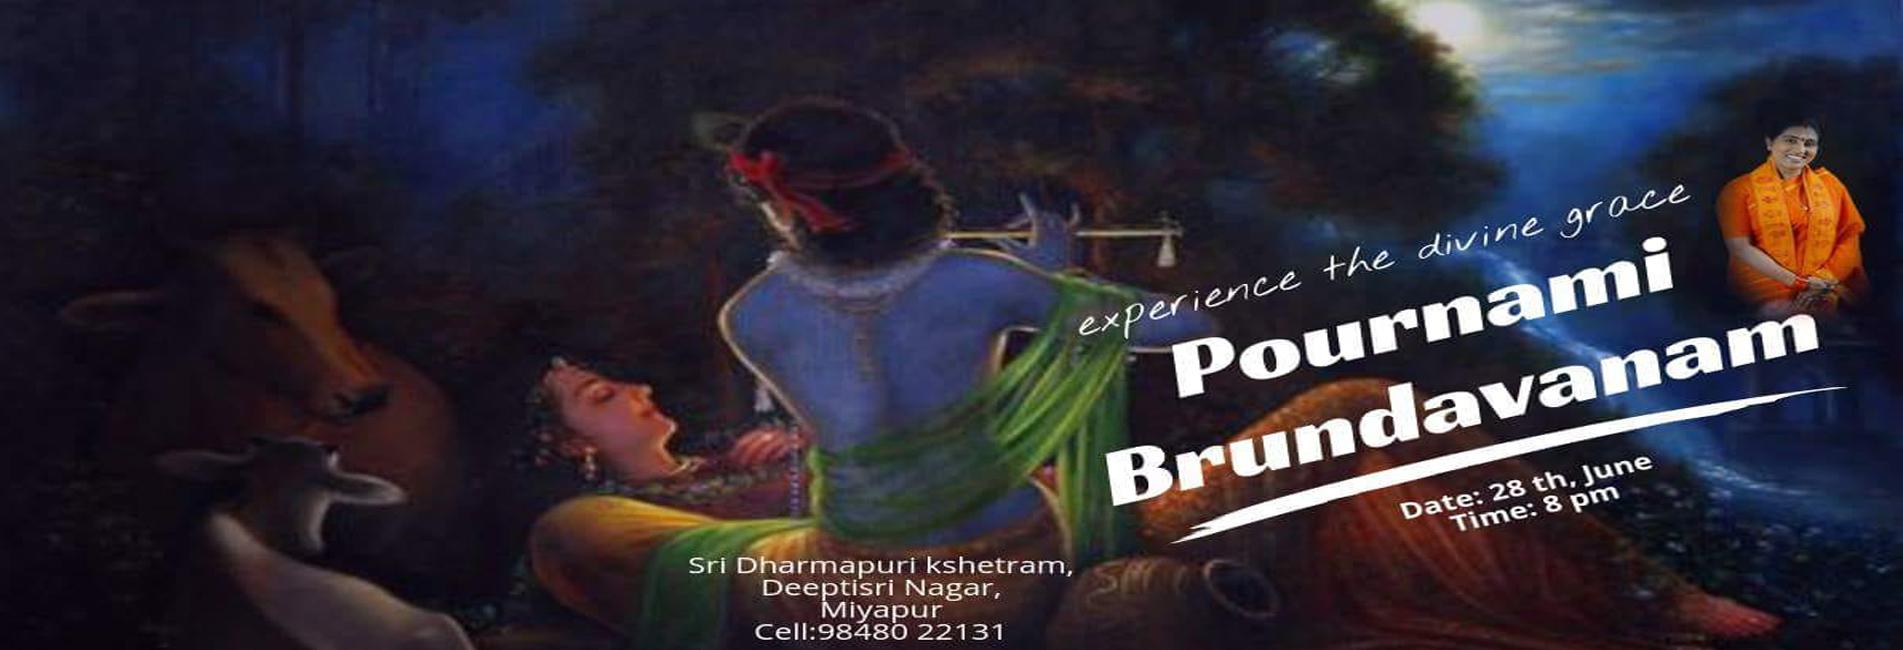 Pournami Brundavanam on 28th June 2018 Time @ 8pm